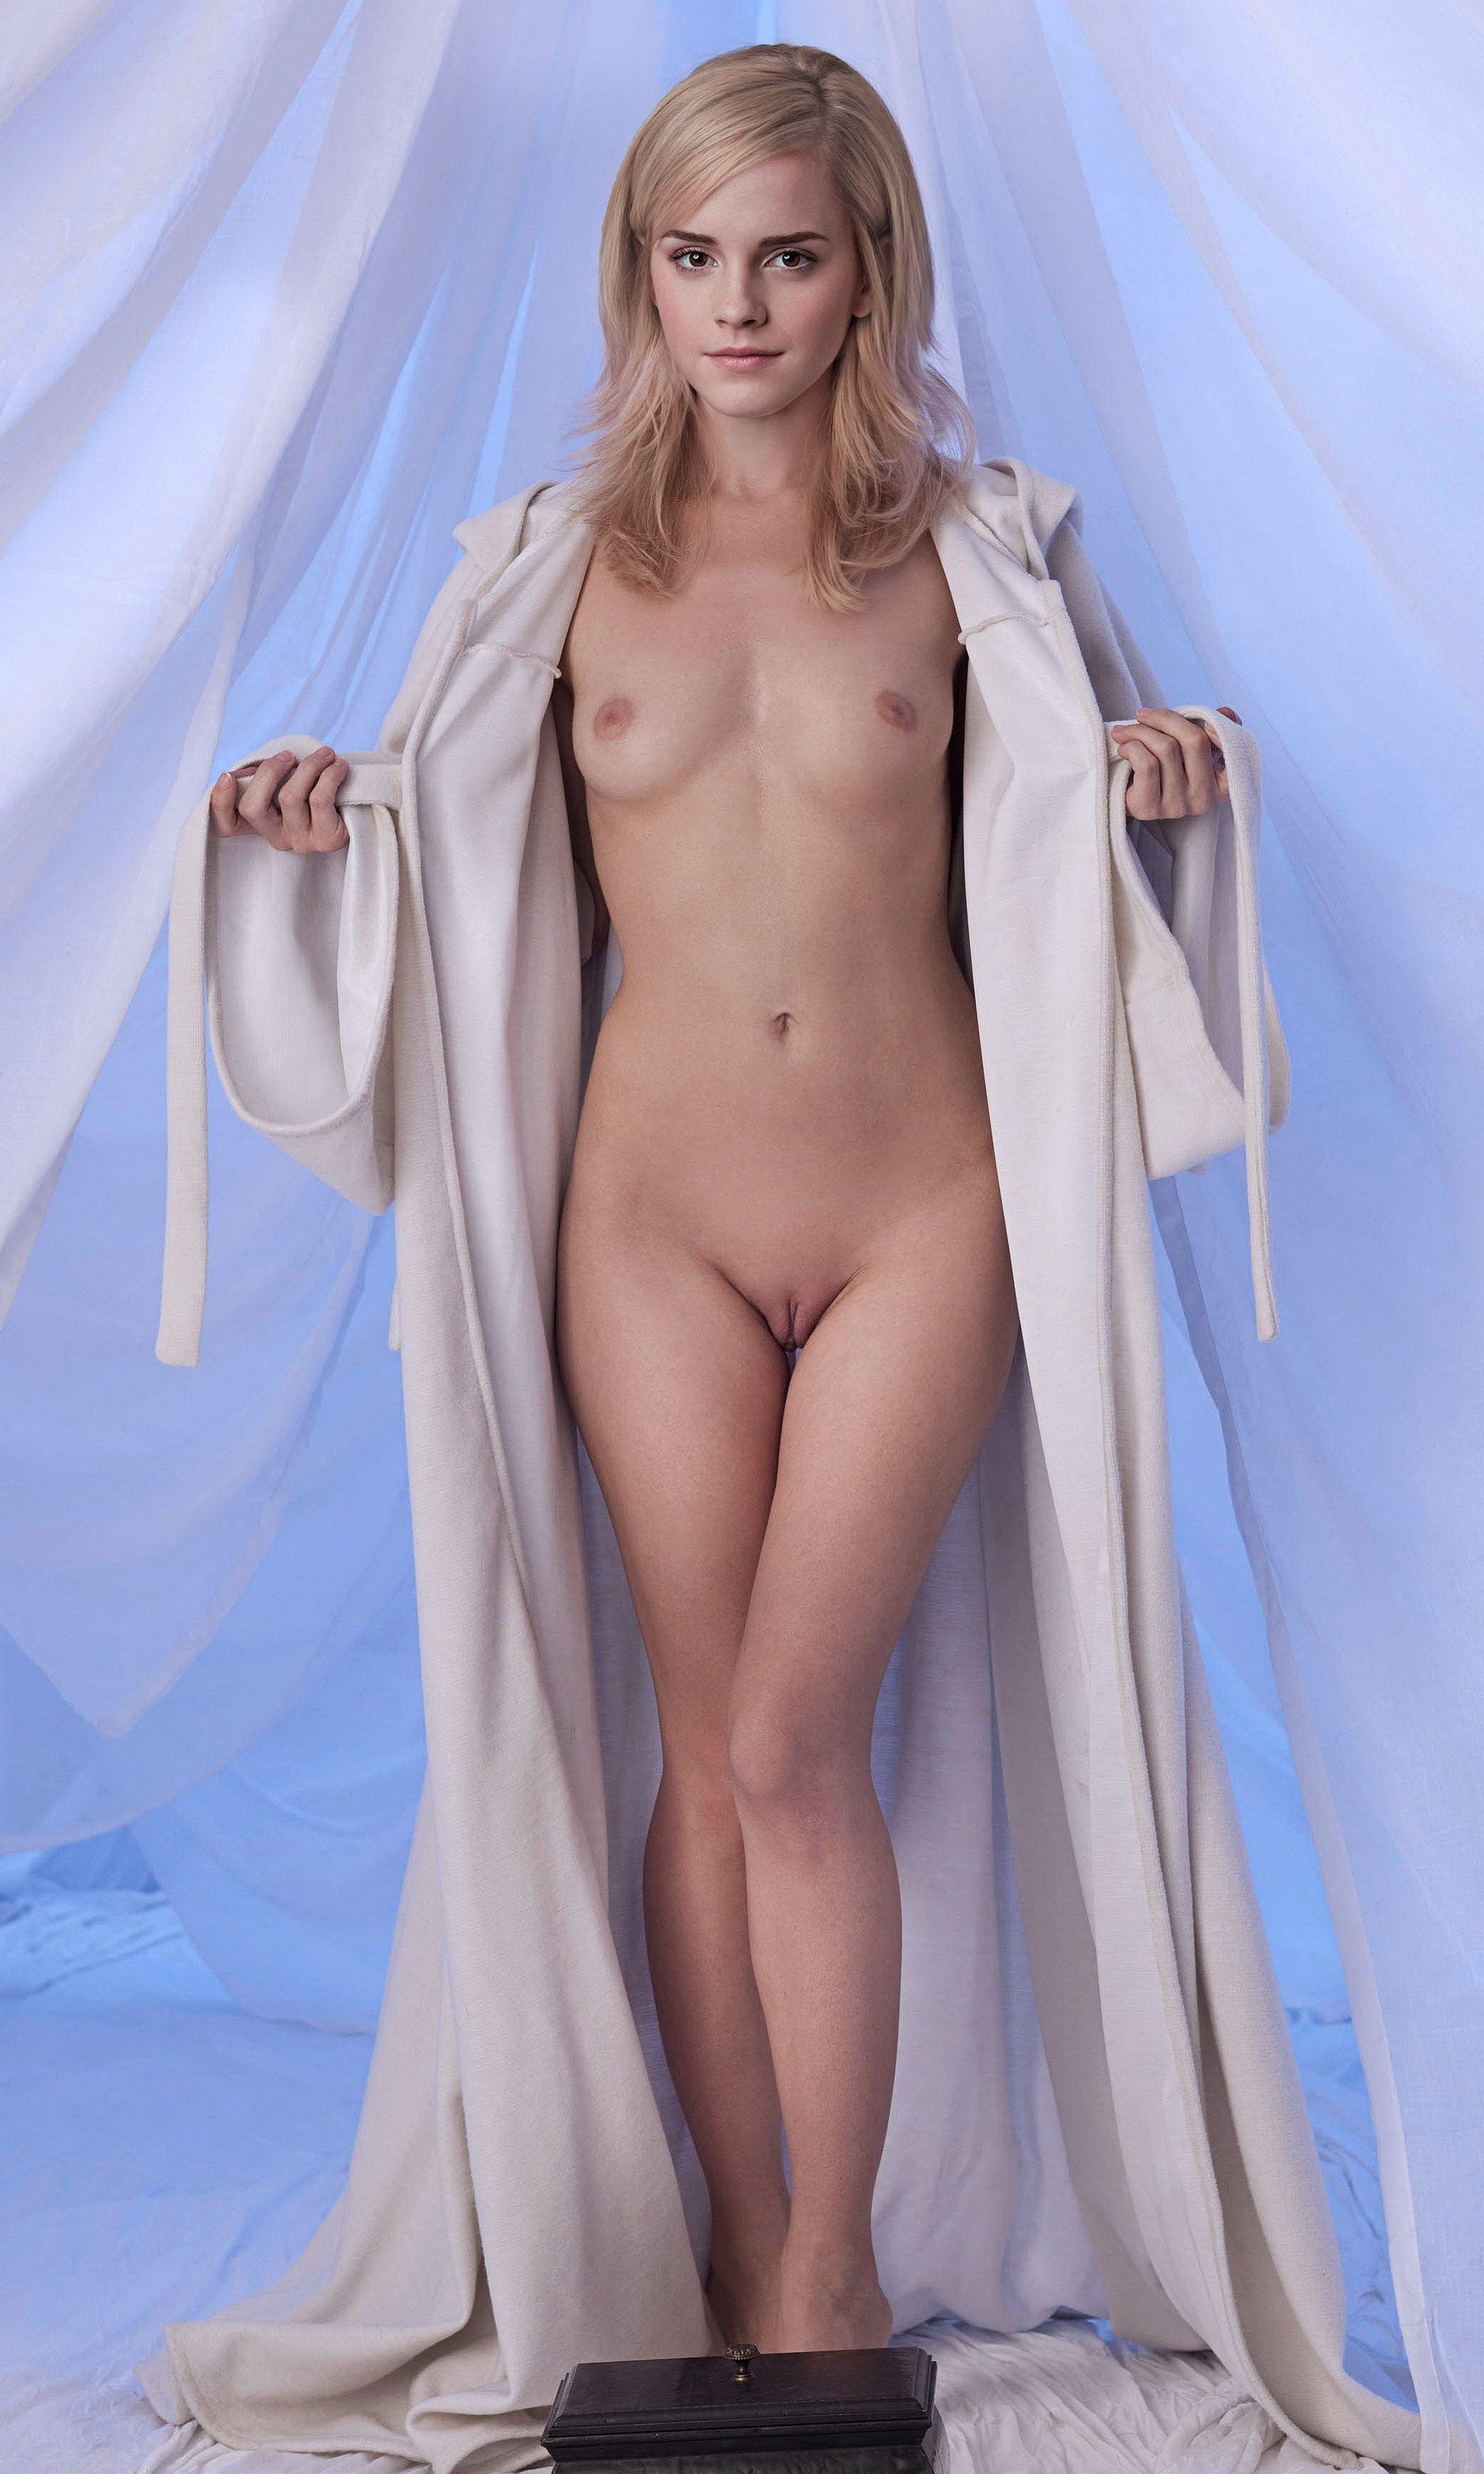 imagetwist.com imagesize:ru nude